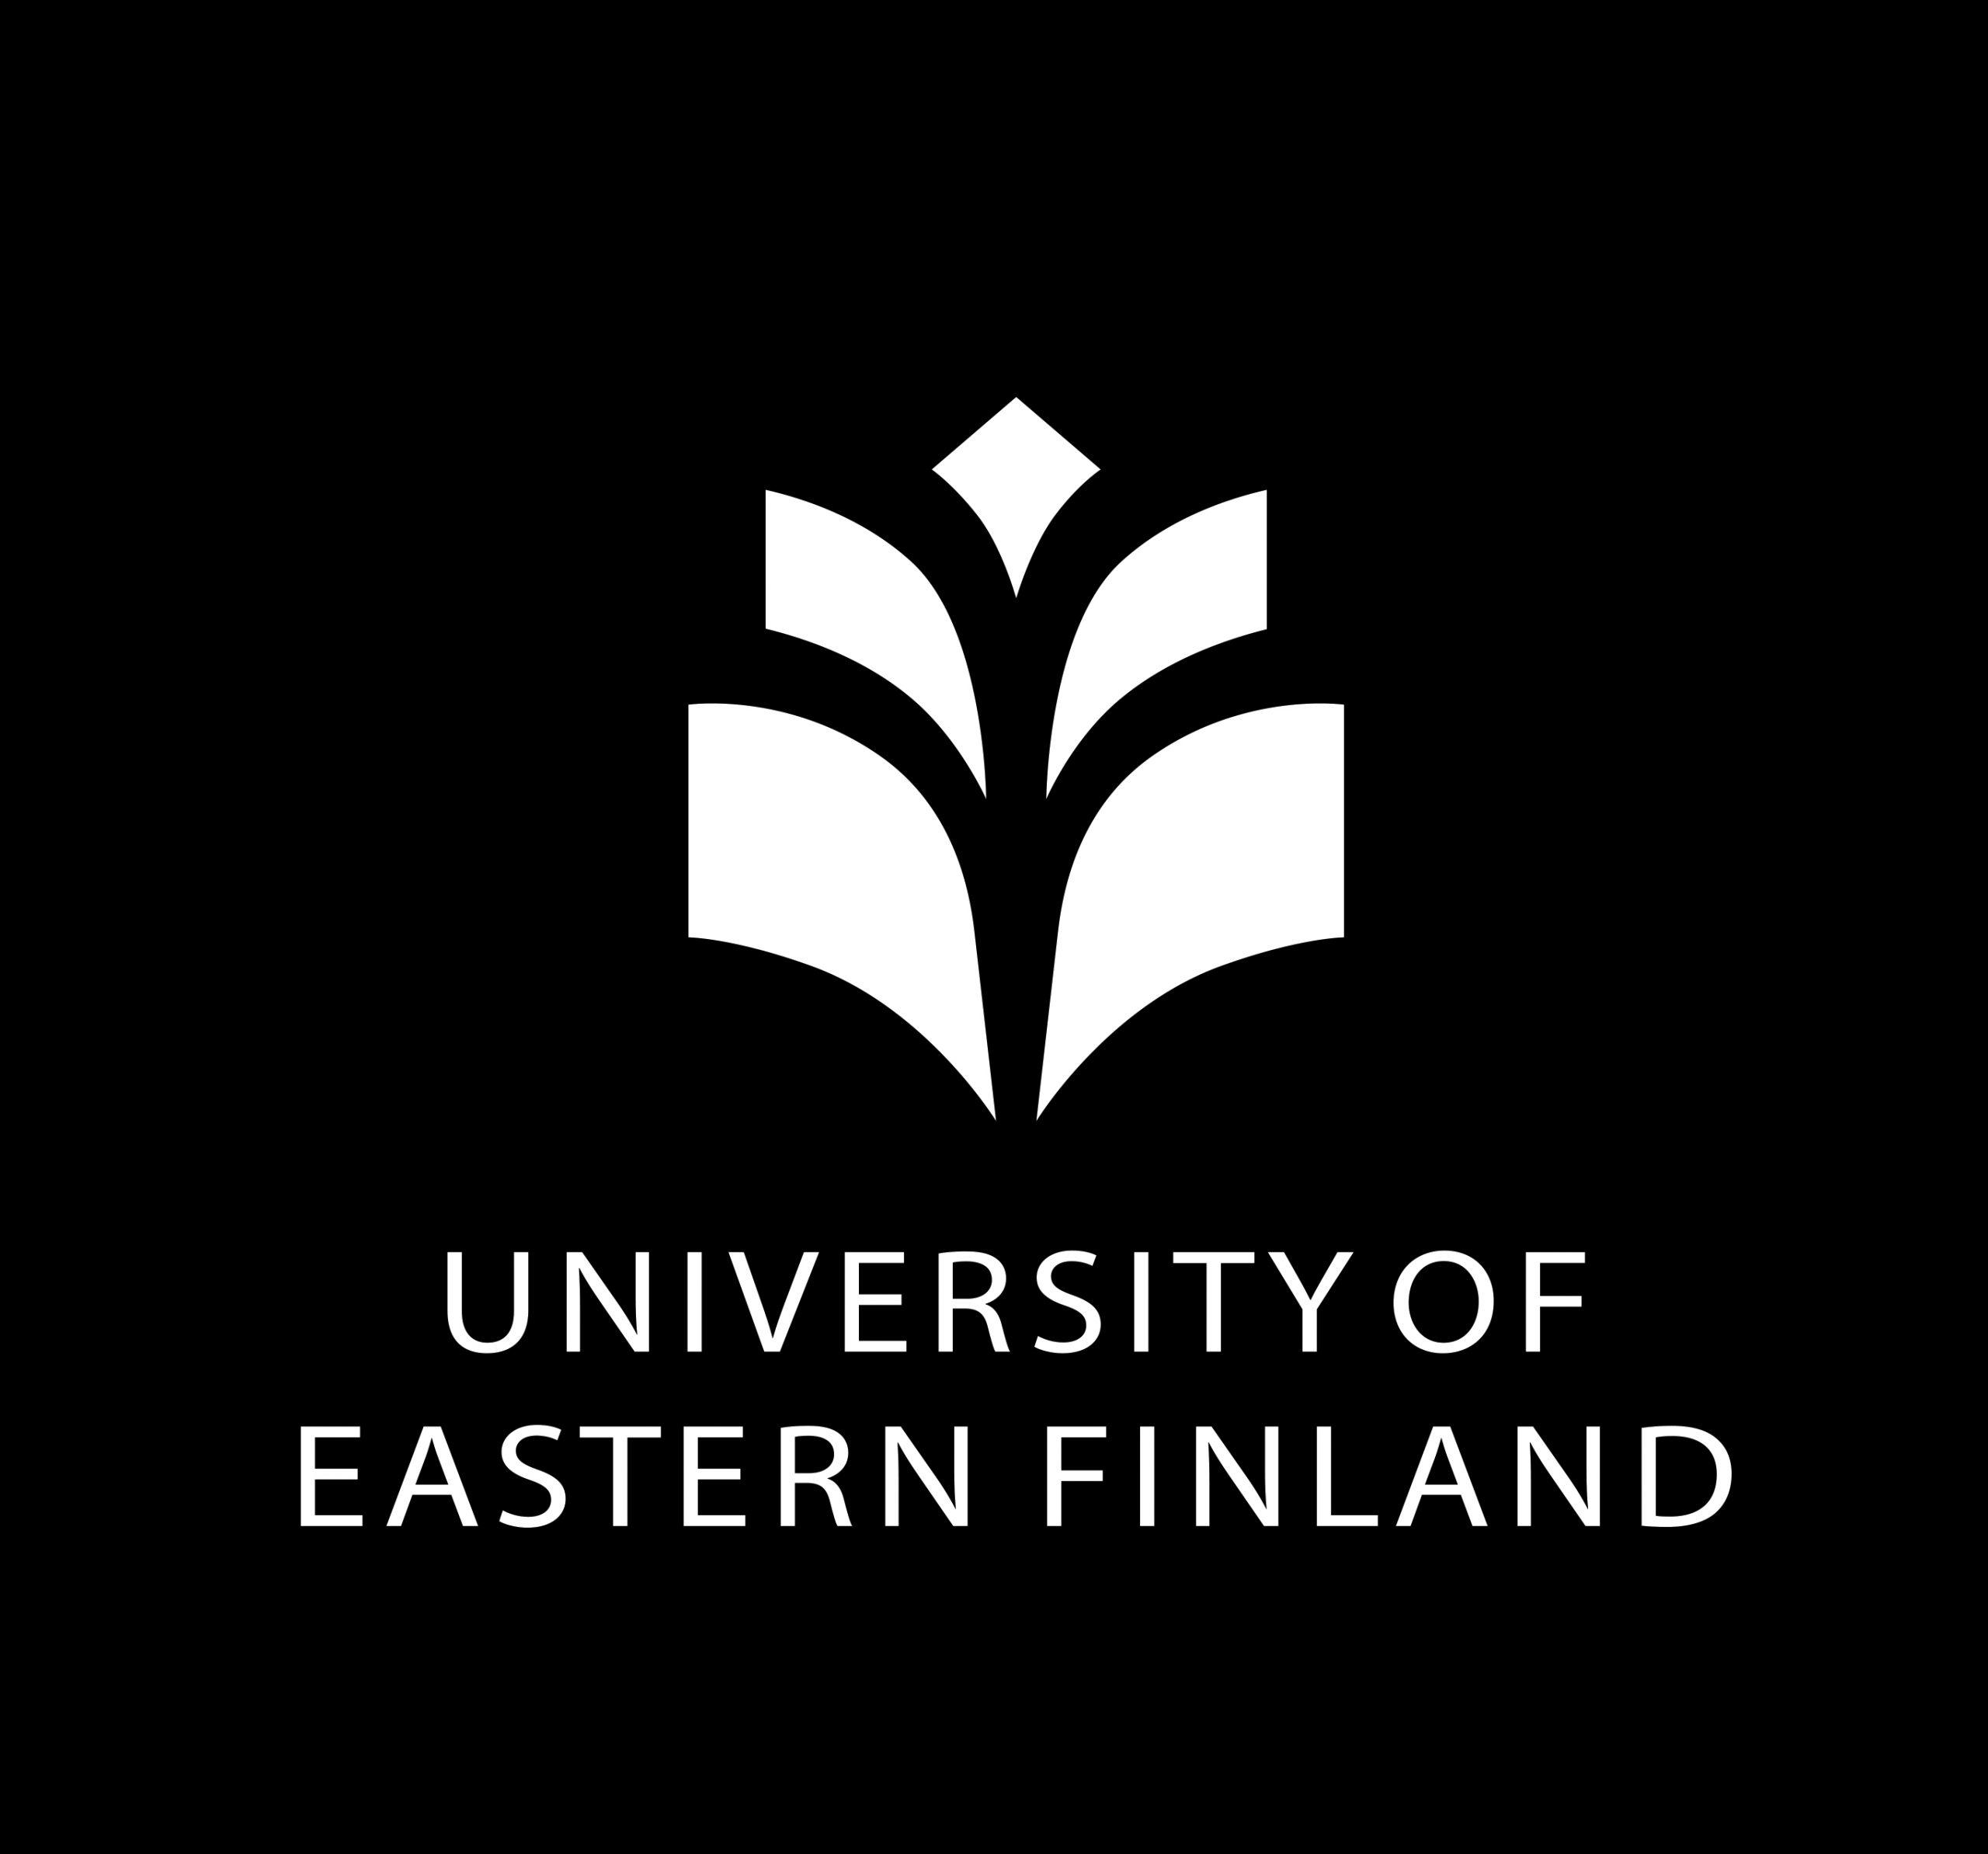 University of Eastern Finland logo on black background